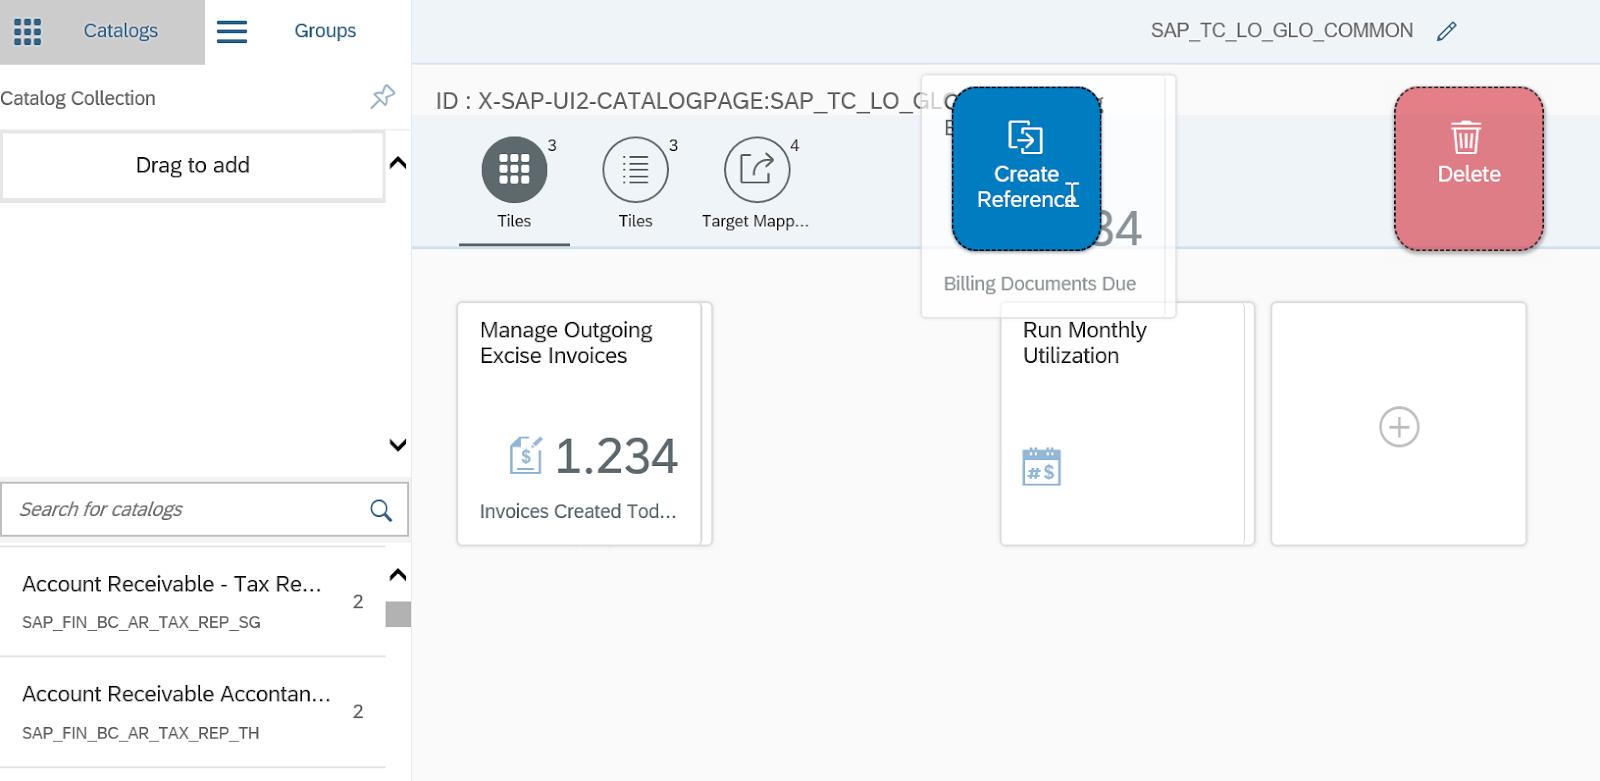 SAP Fiori Launchpad Designer - Create Reference